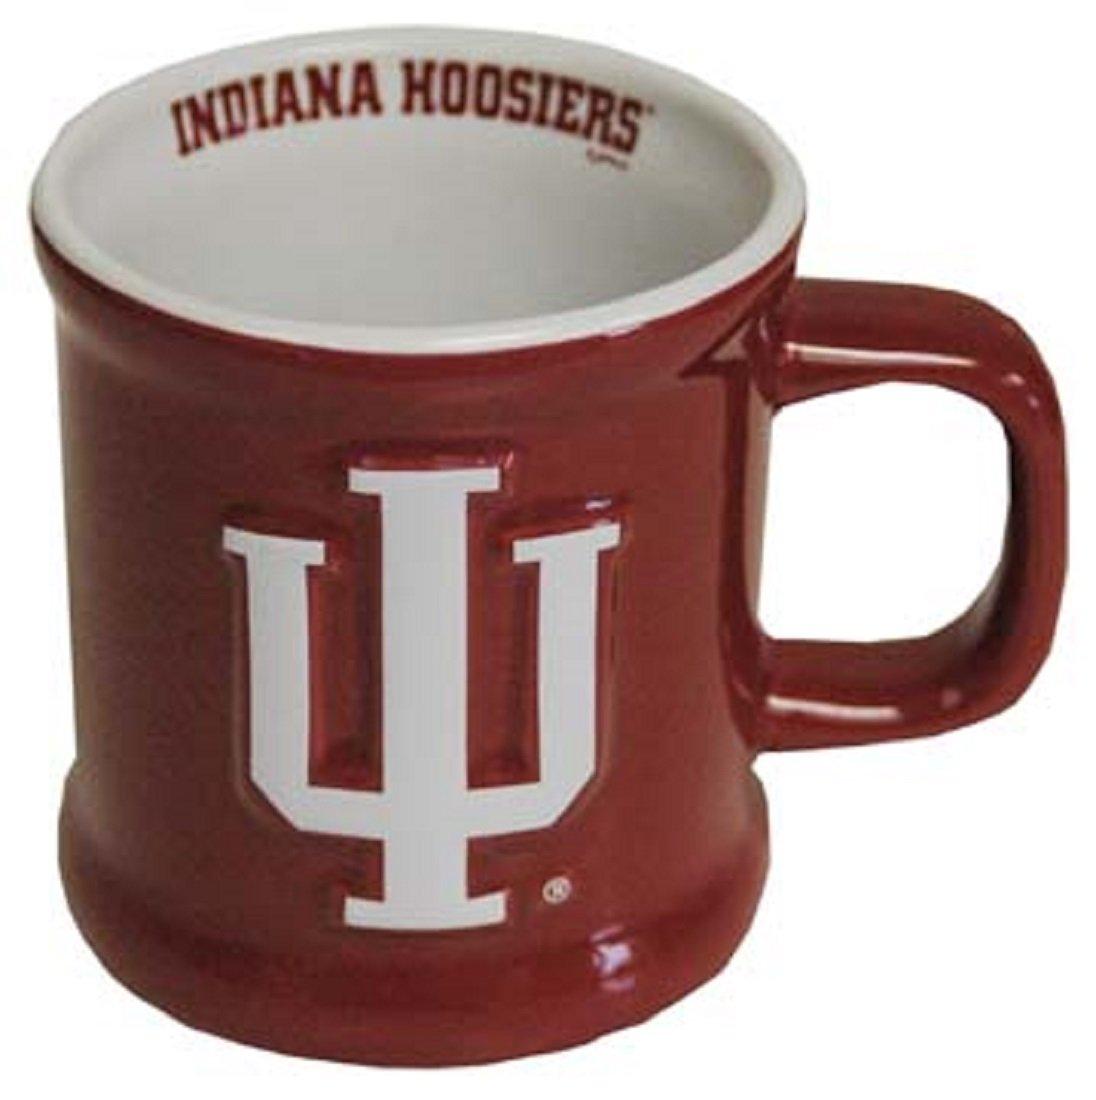 Jenkins Enterprises Indiana Hoosiers Ceramic Relief Mug